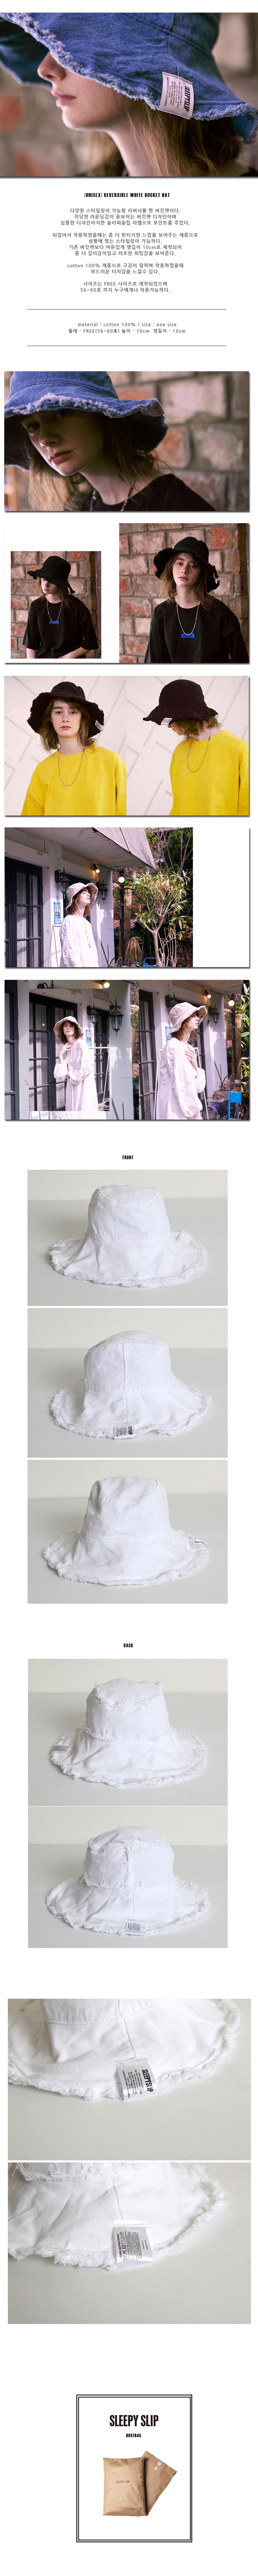 reversible-white-bucket-hat.jpg